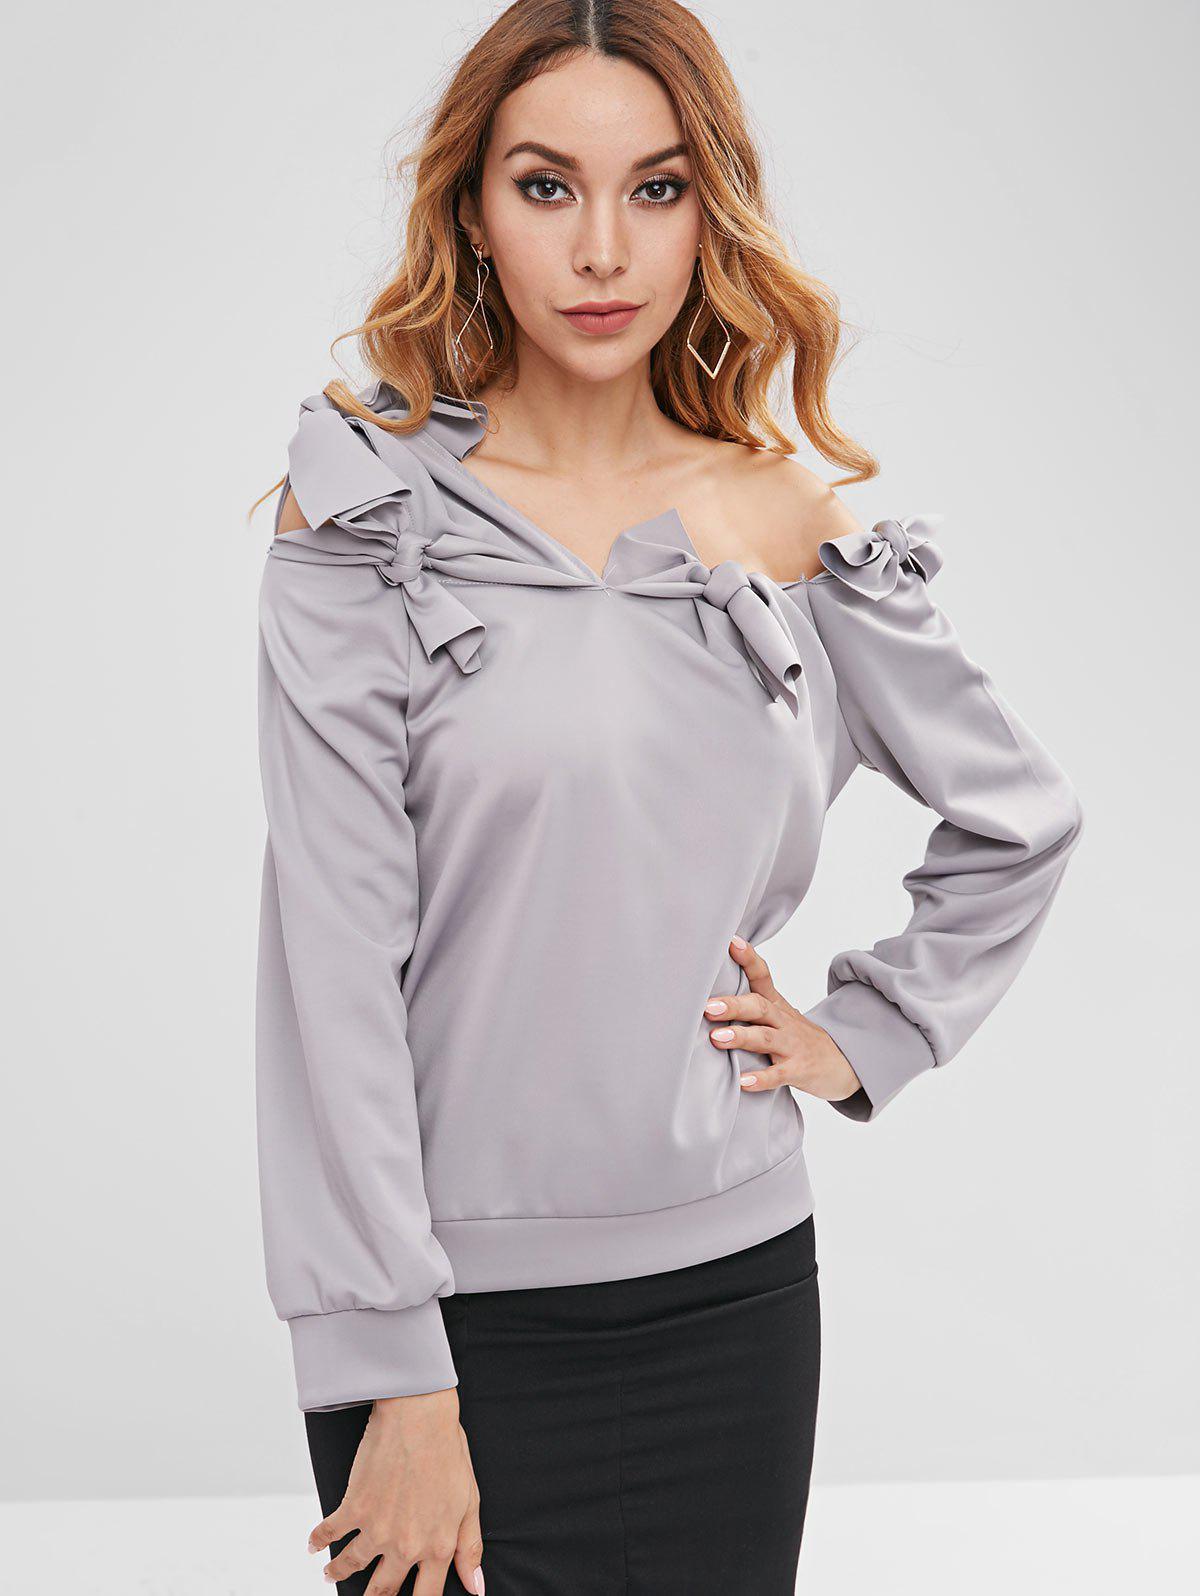 Knotted One Shoulder Sweatshirt